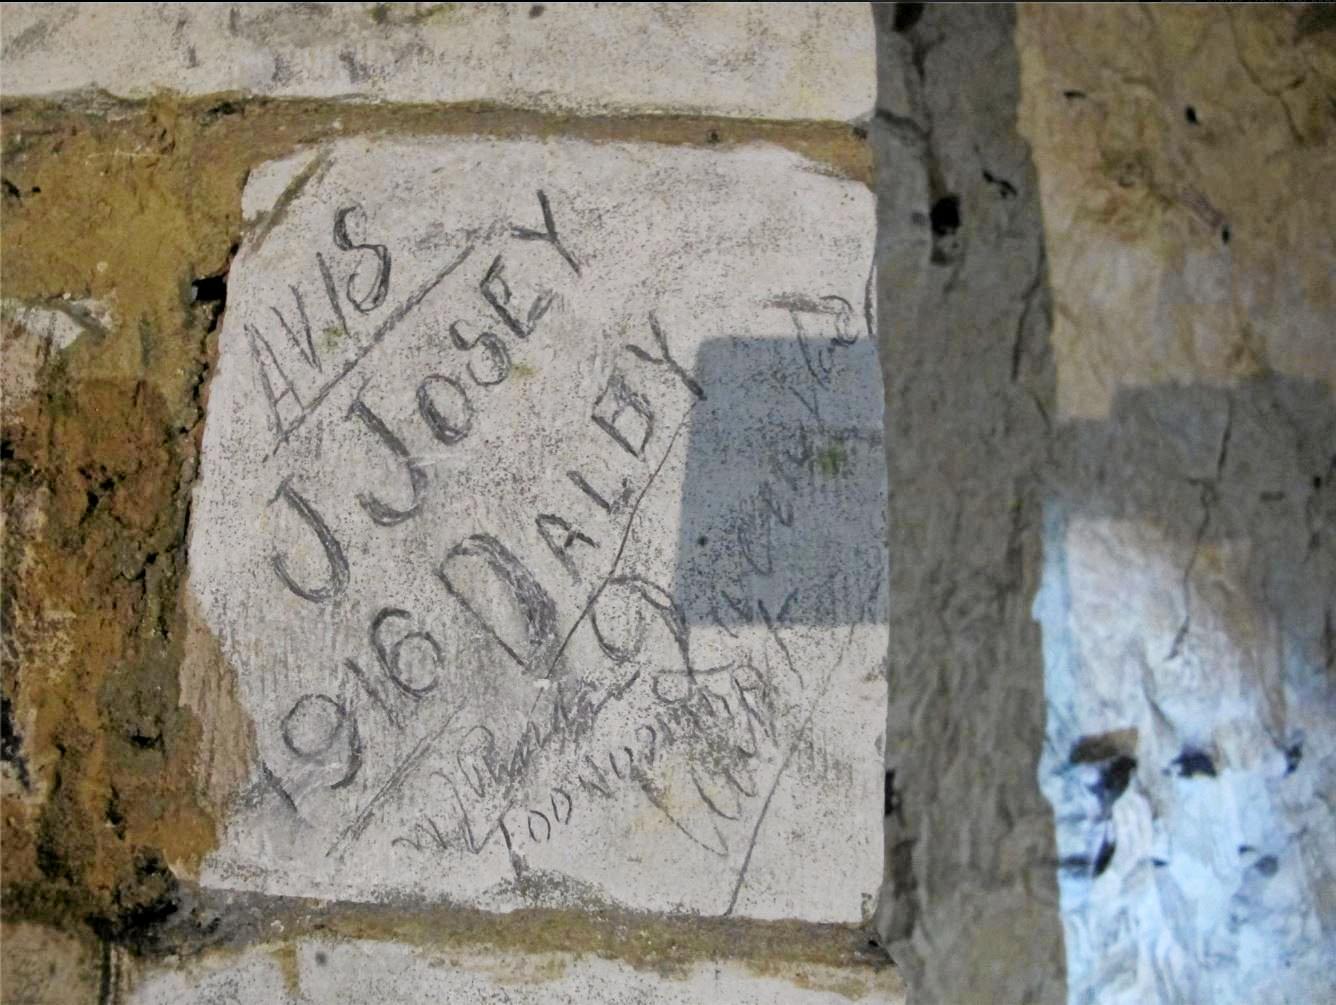 The signature of James Walter Hobbs Josey.